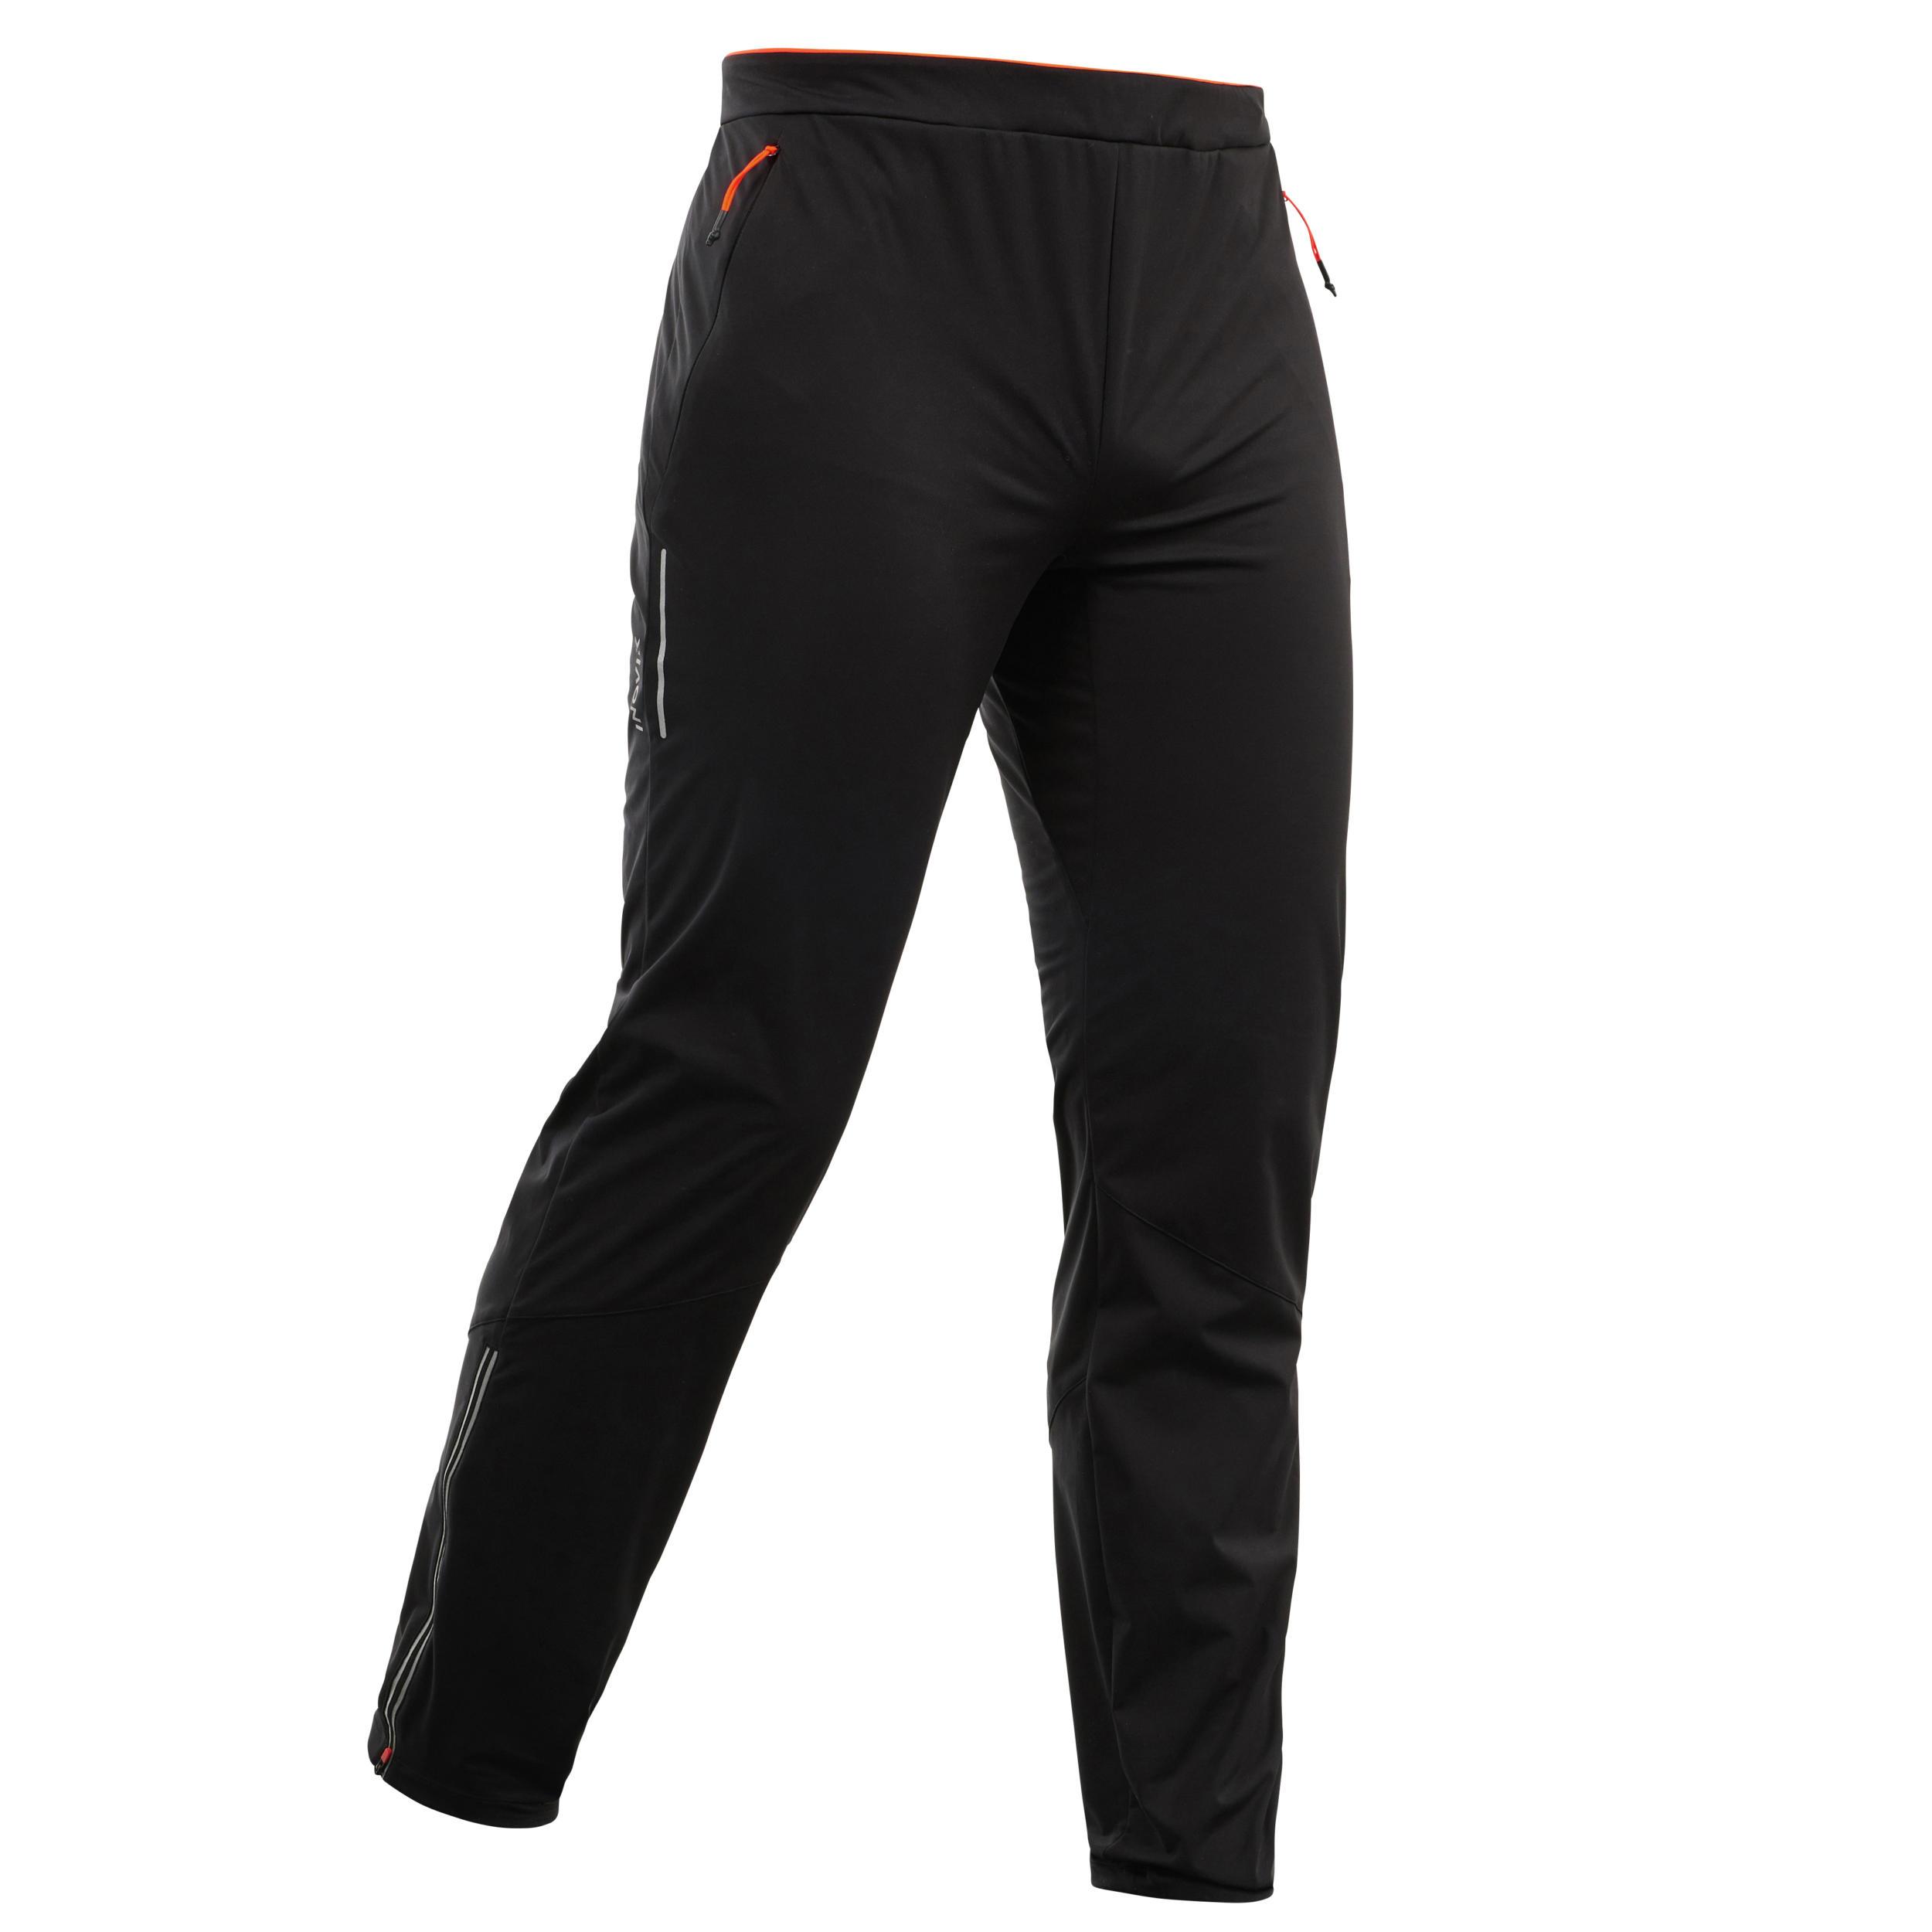 Pantalon XC S 500 Bărbați imagine